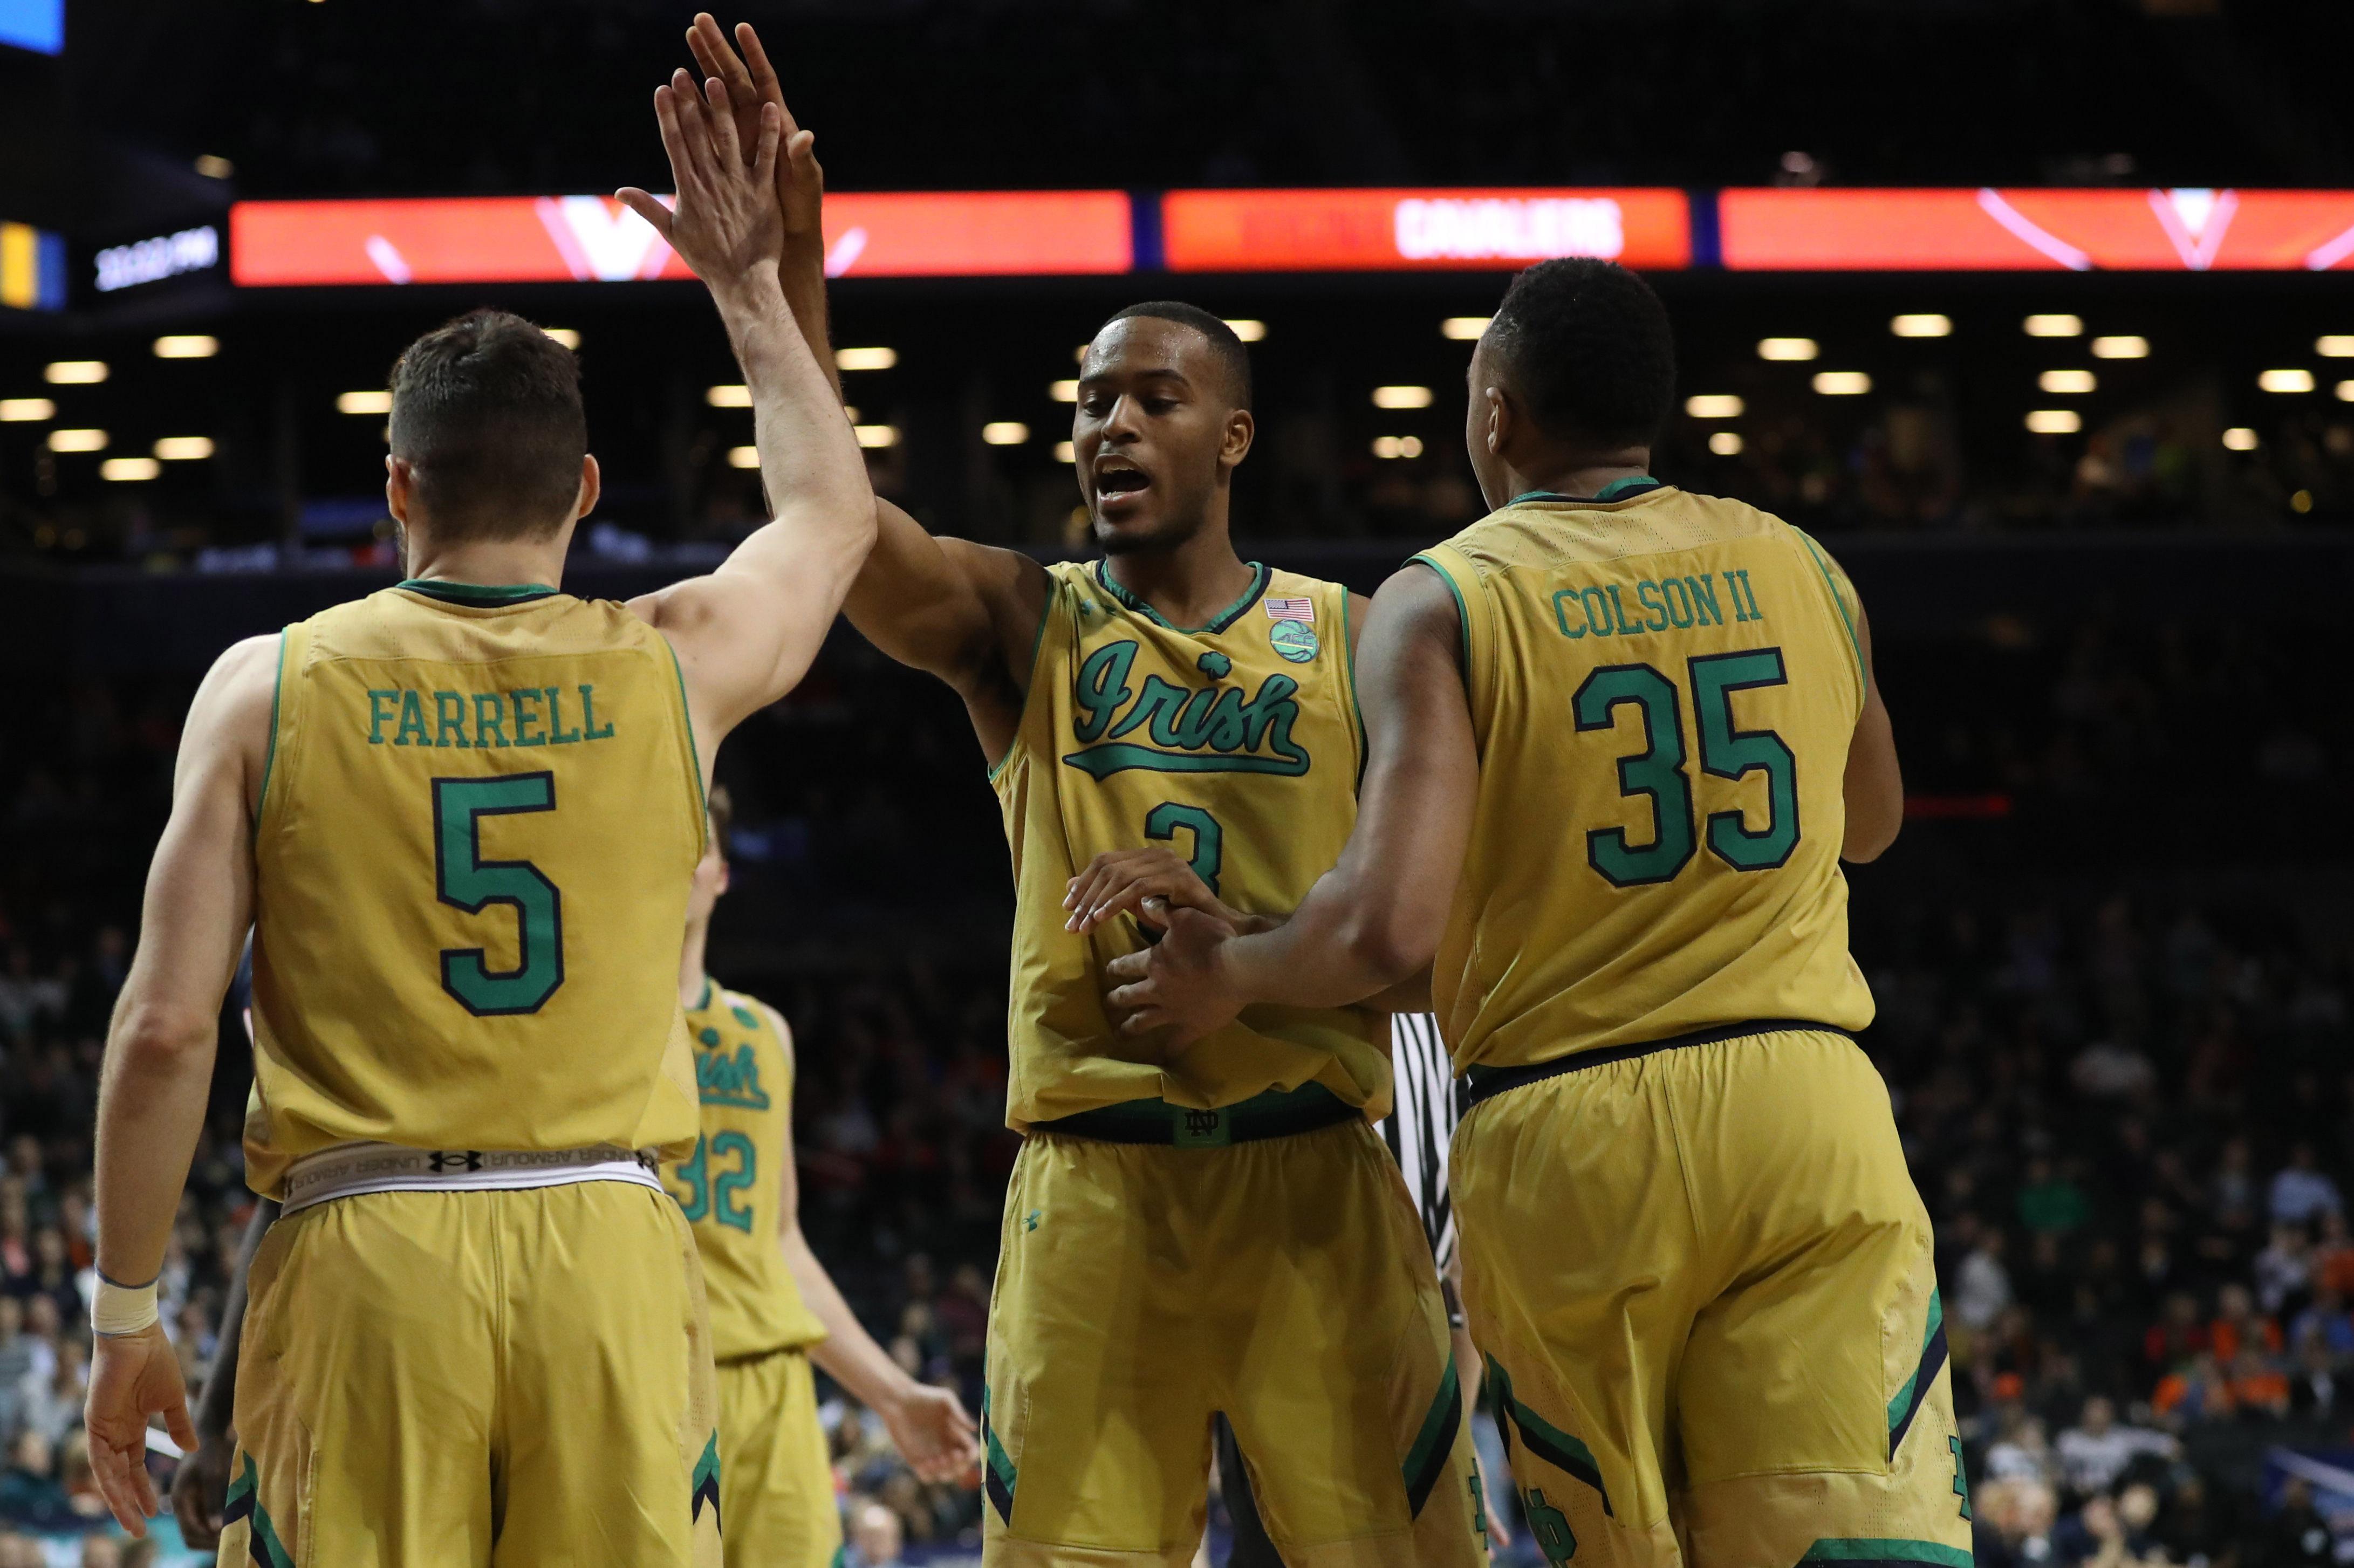 9929229-ncaa-basketball-acc-conference-tournament-notre-dame-fighting-irish-vs-virginia-cavaliers